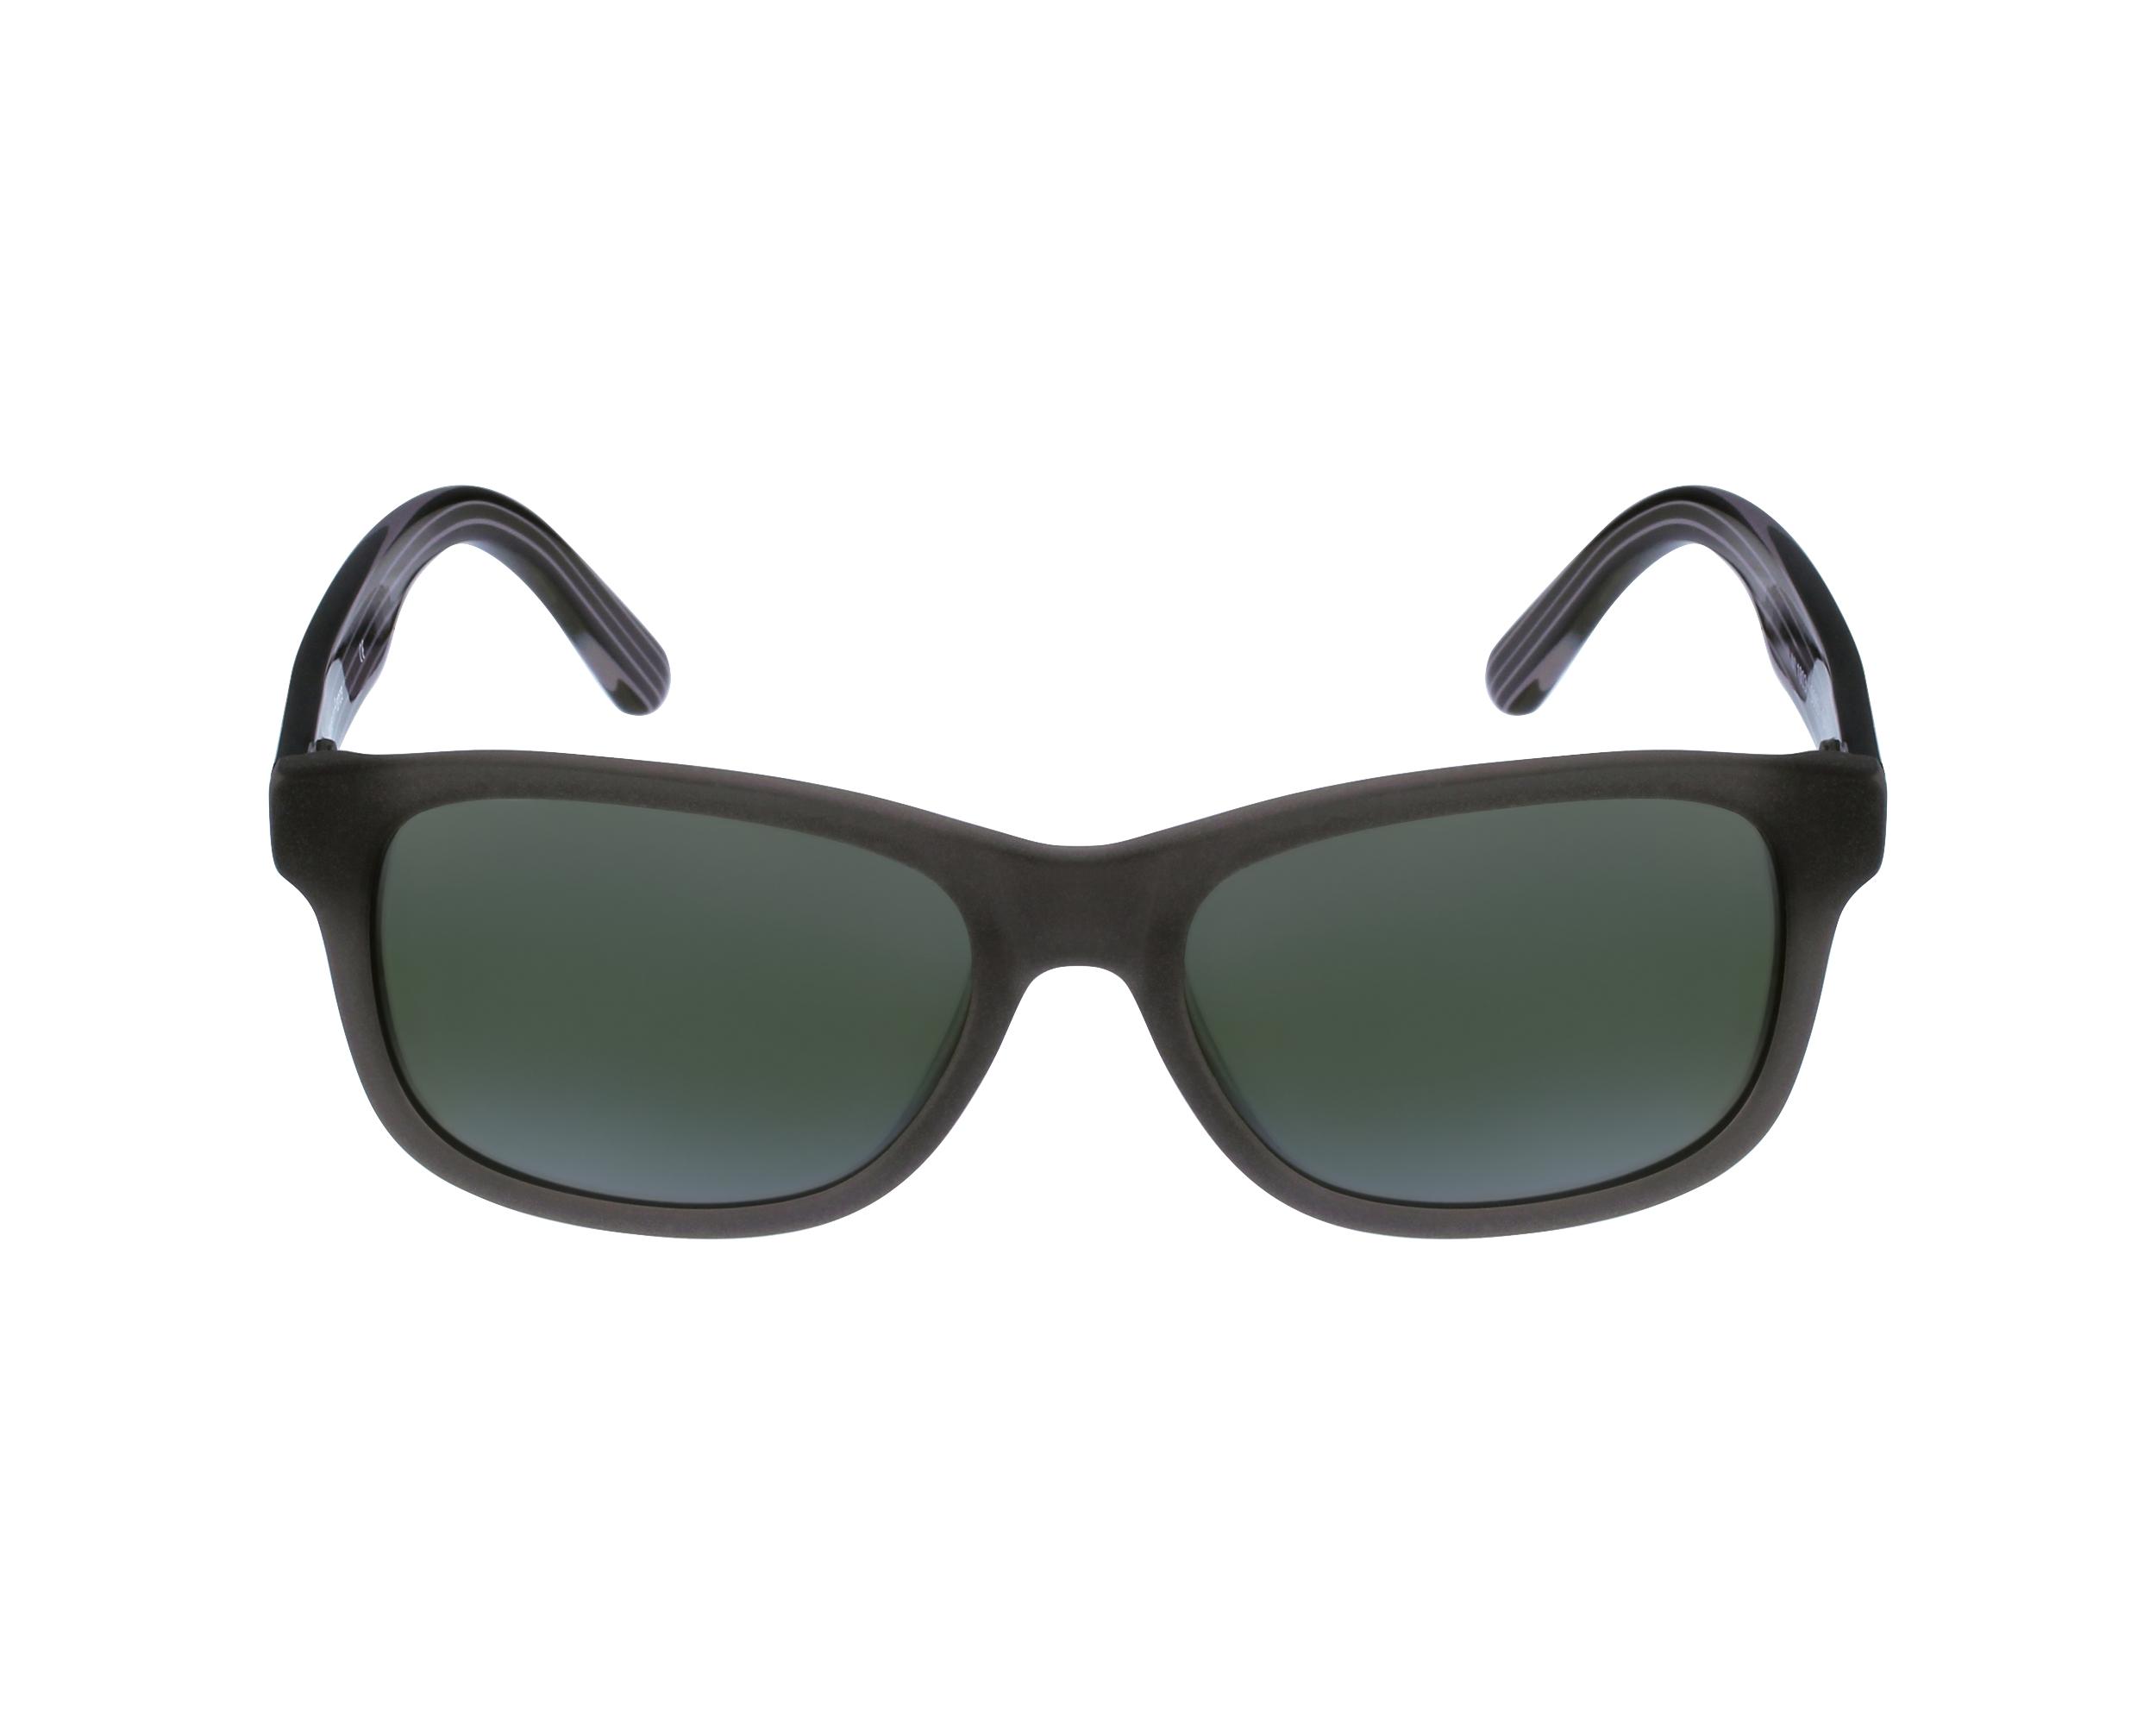 lunettes de soleil vuarnet vl 1303 0003 gris avec des verres gris vert. Black Bedroom Furniture Sets. Home Design Ideas